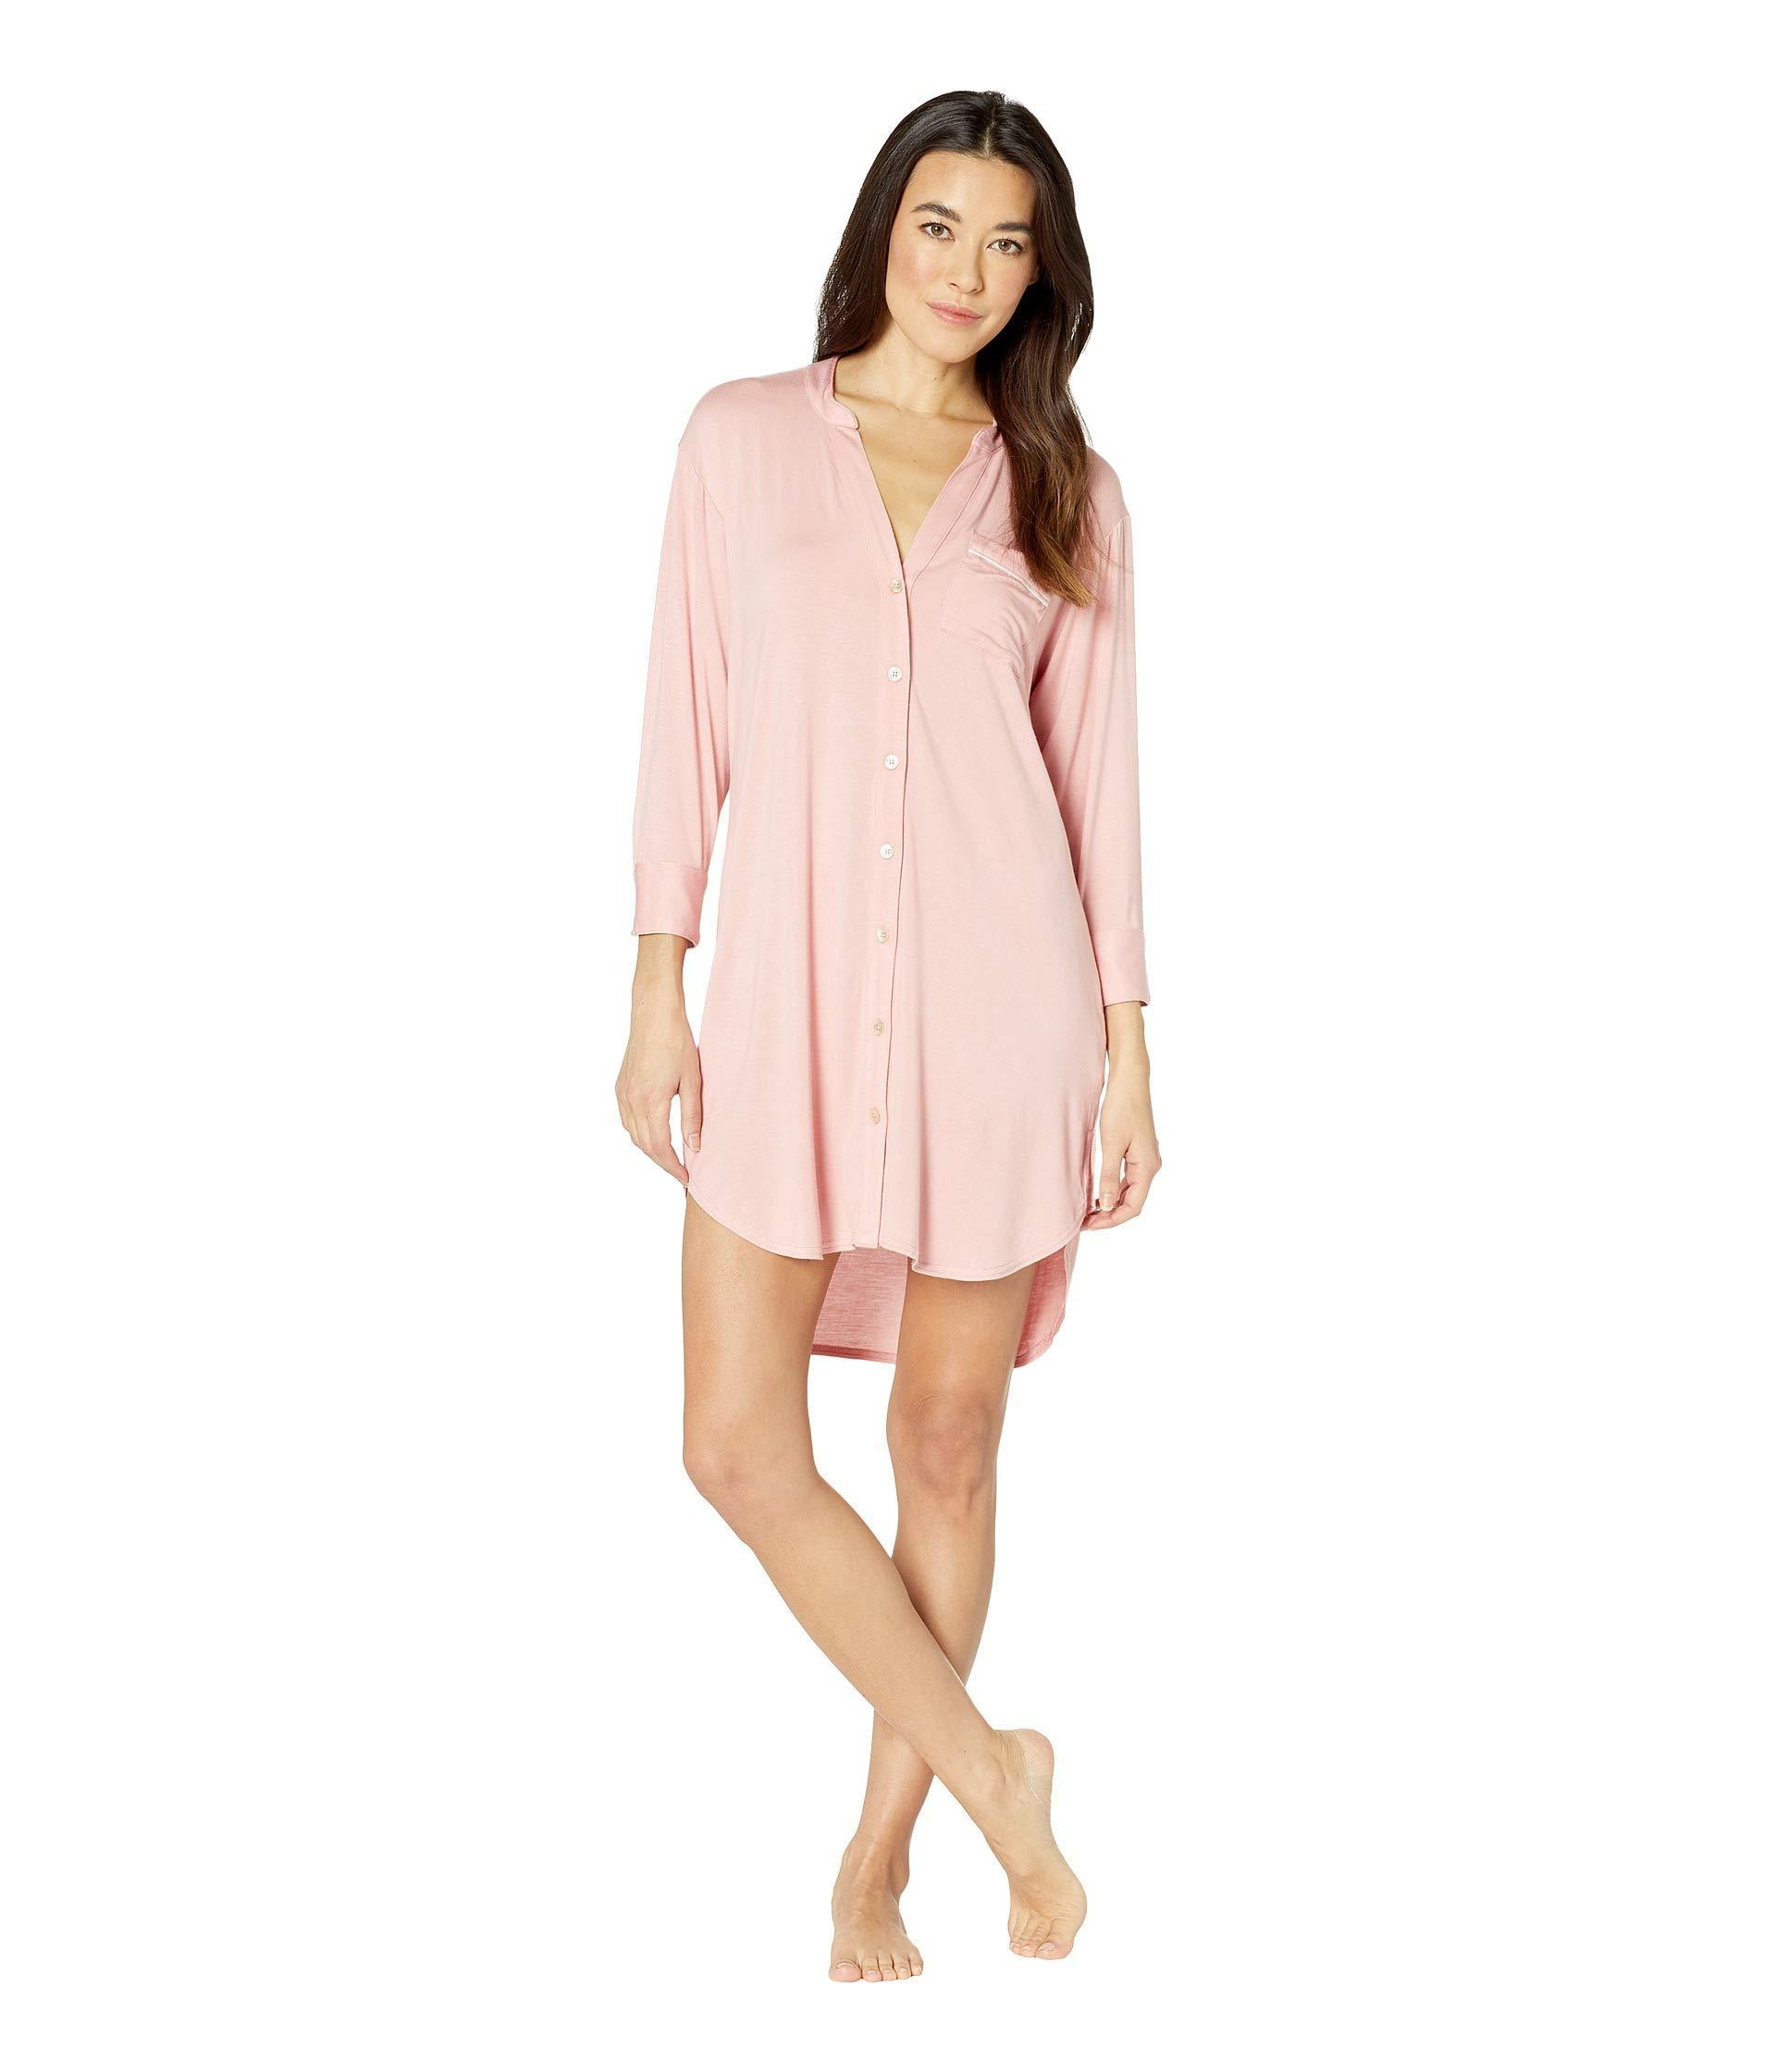 a8986c60d3 Lyst - UGG Vivian Knit Sleepshirt (pink Dawn) Women s Pajama in Pink